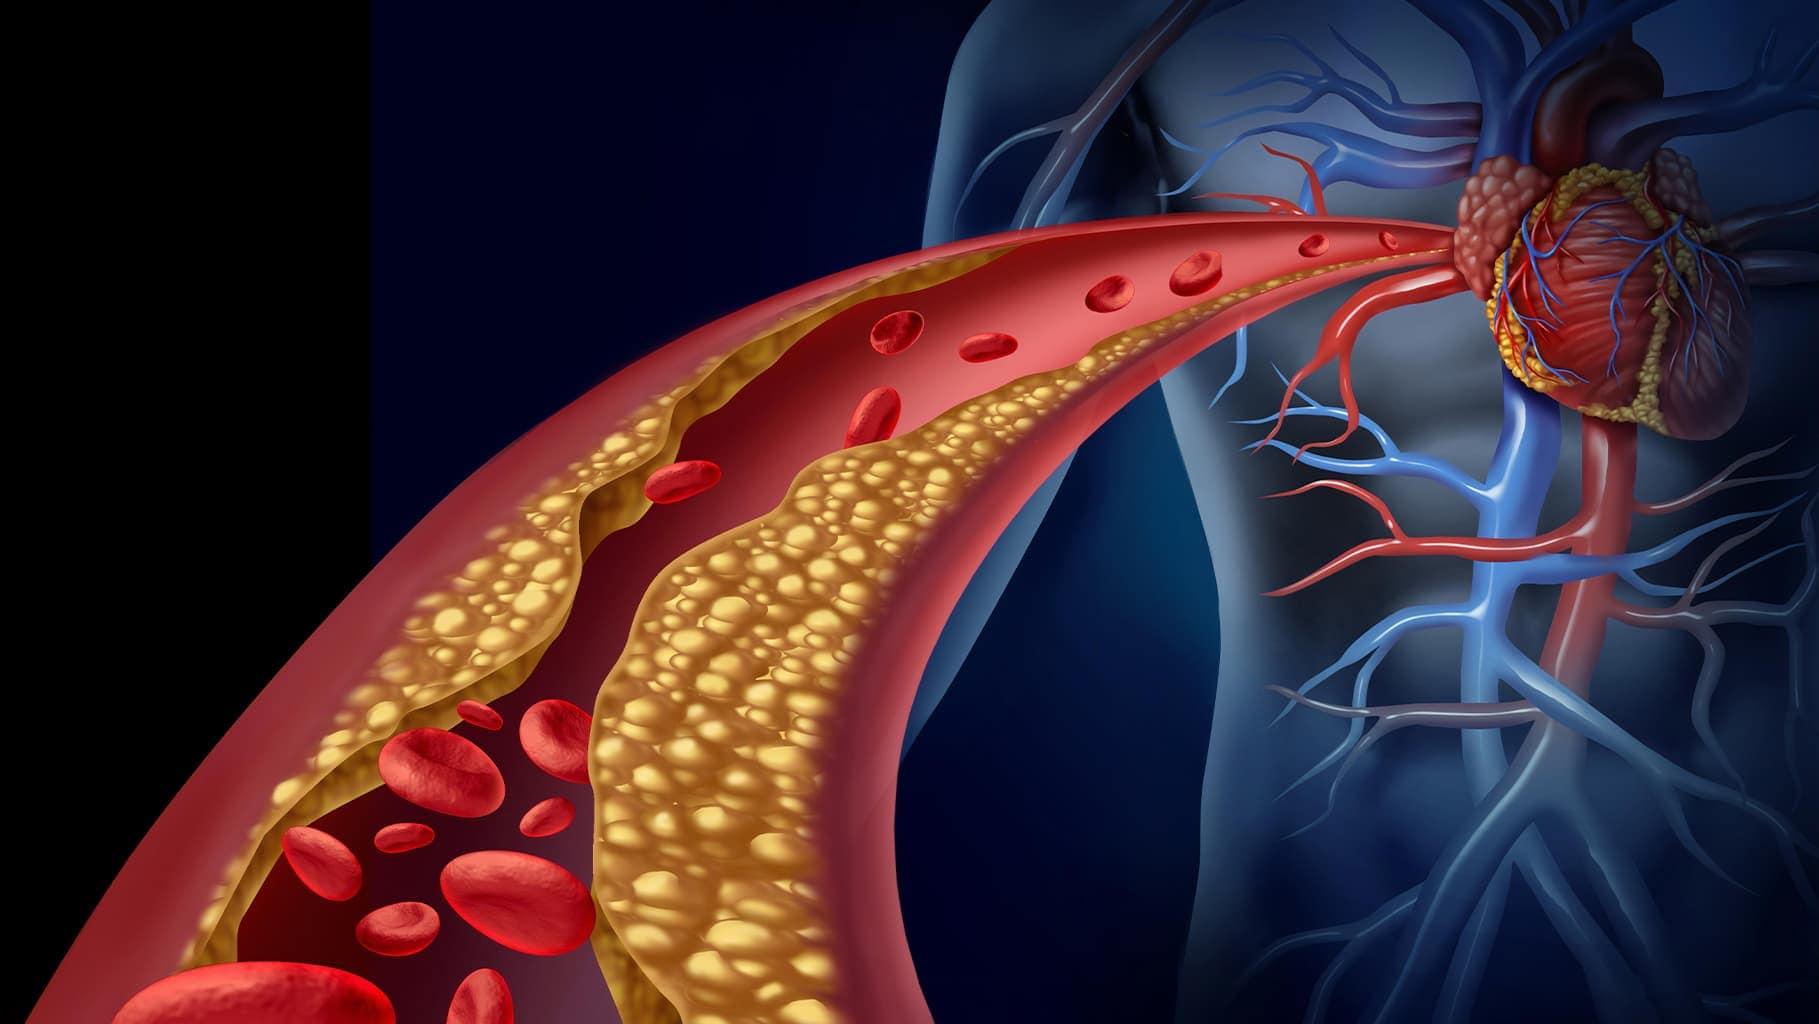 data-for-safe-and-effective-use-of-evolocumab-in-paediatric-familial-hypercholesterolaemia